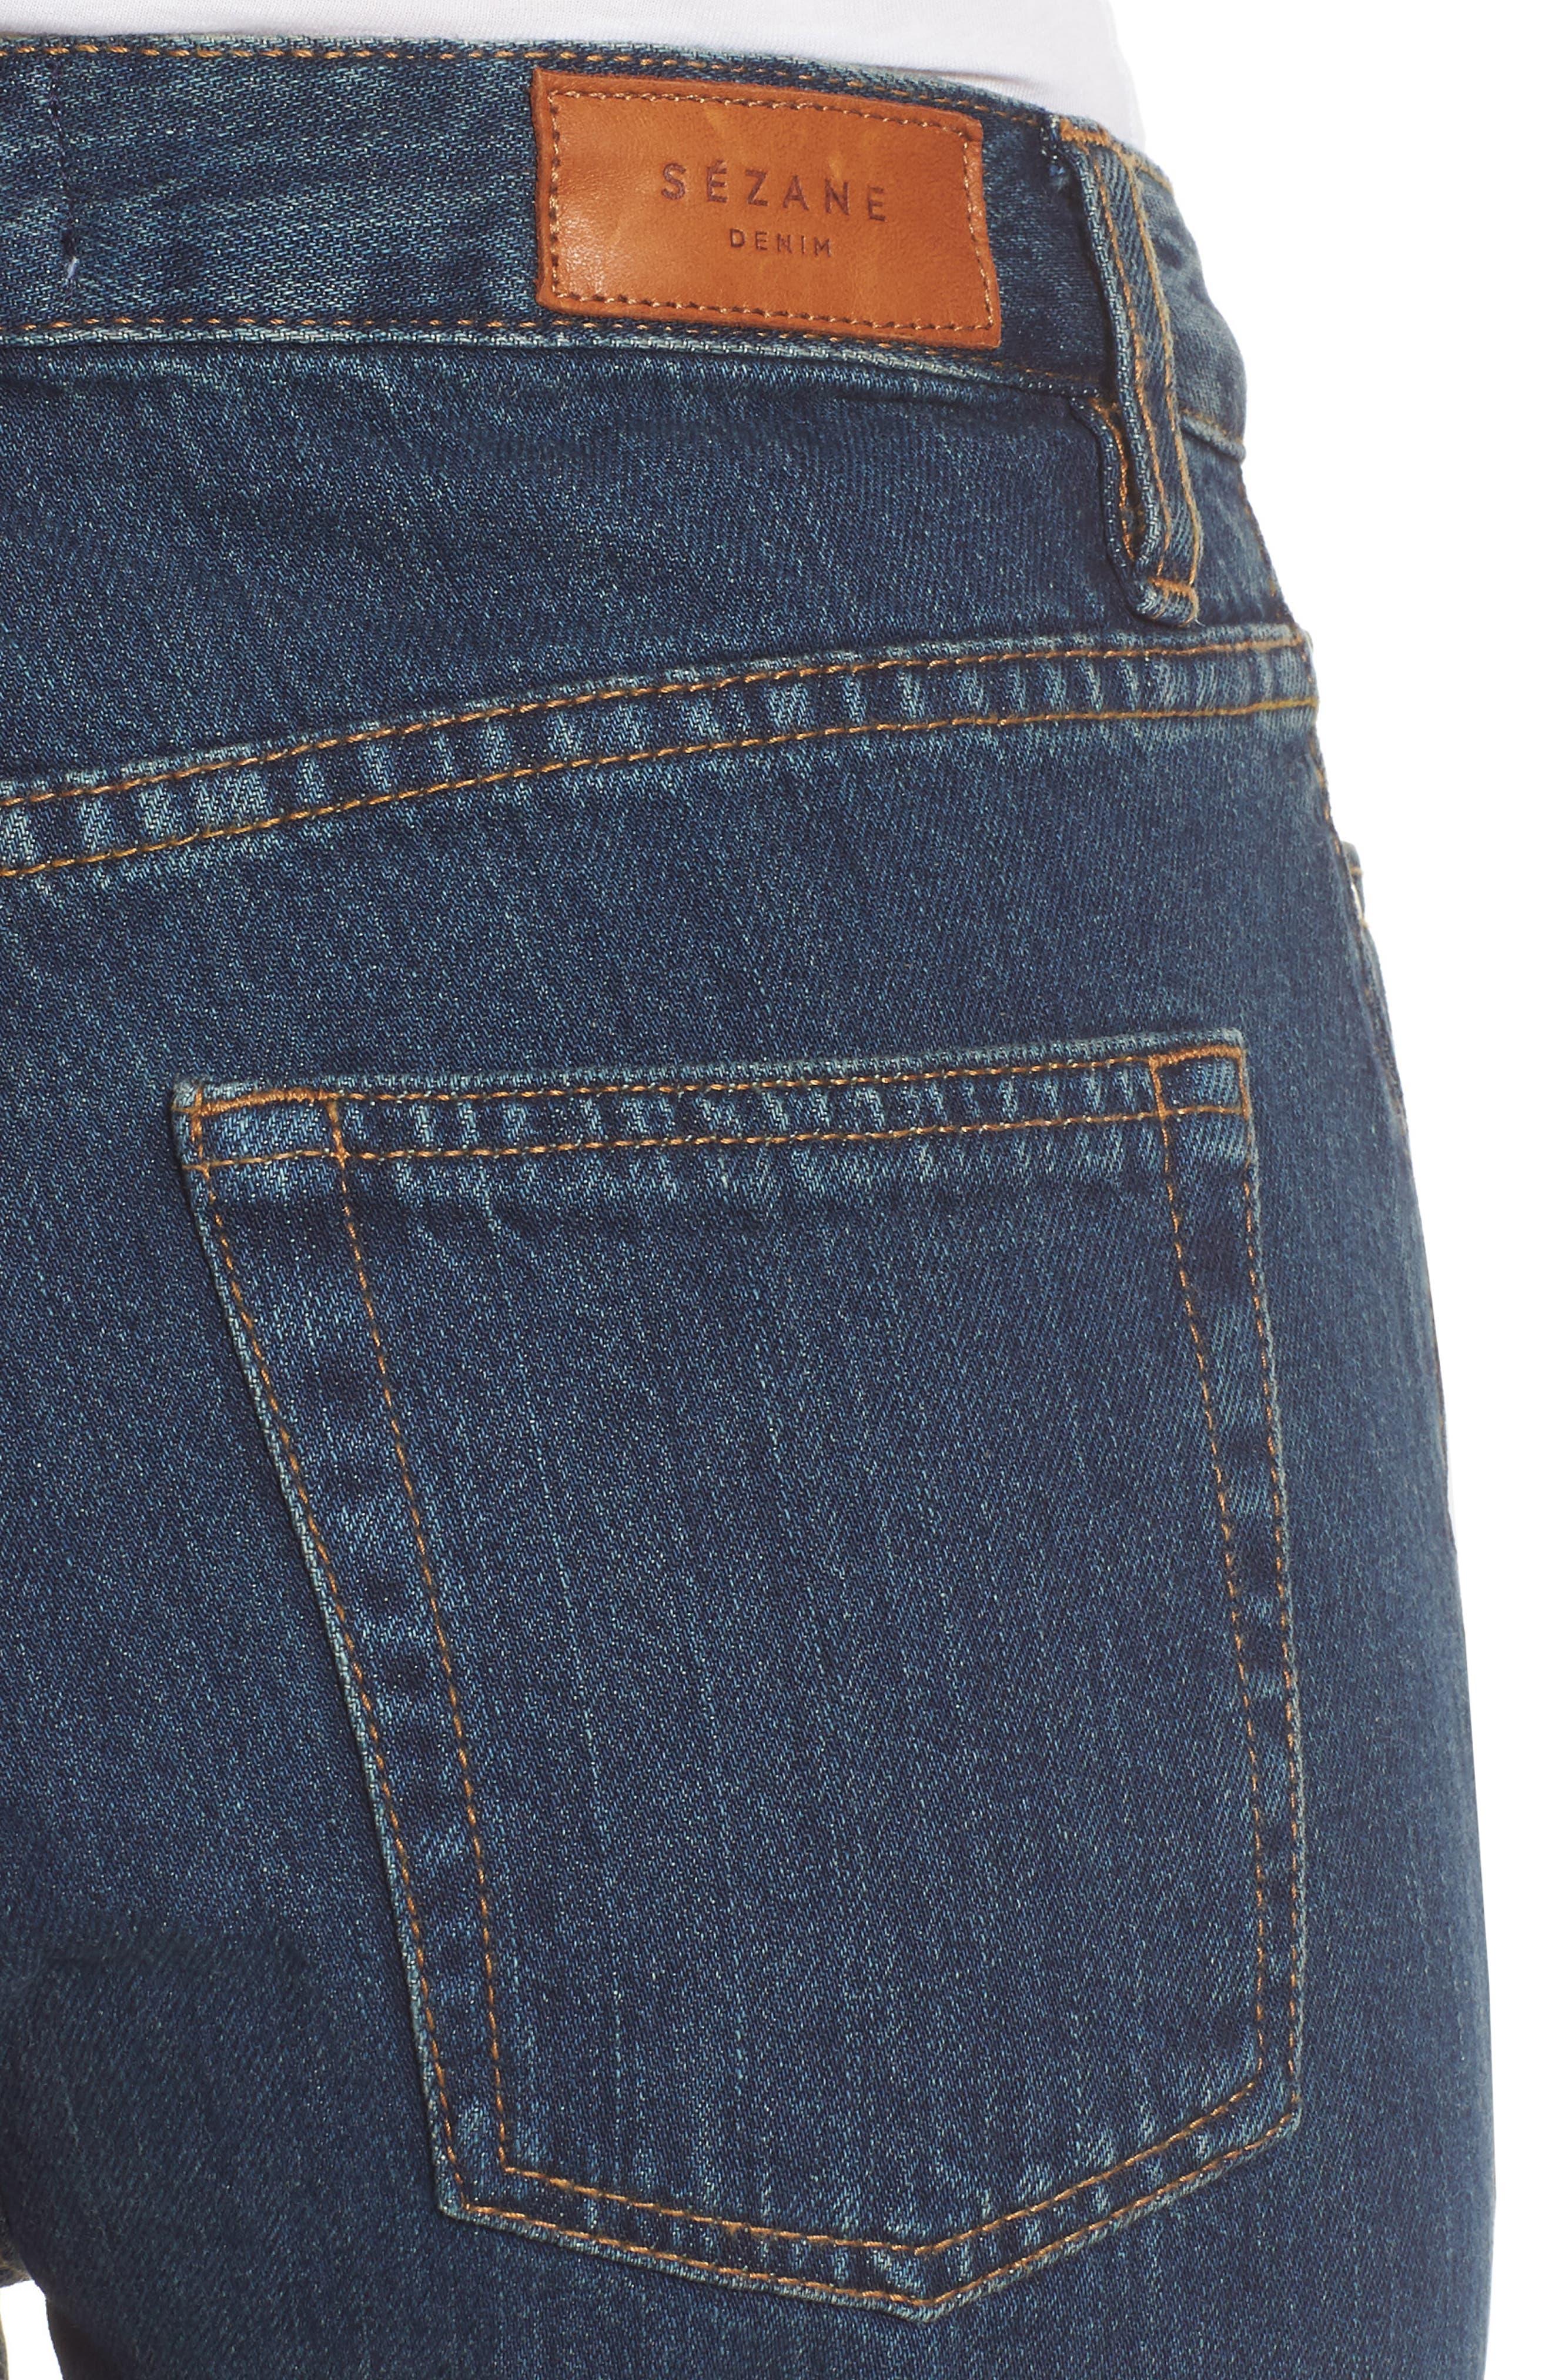 1970 The Flared Crop Jeans,                             Alternate thumbnail 4, color,                             Blue Denim